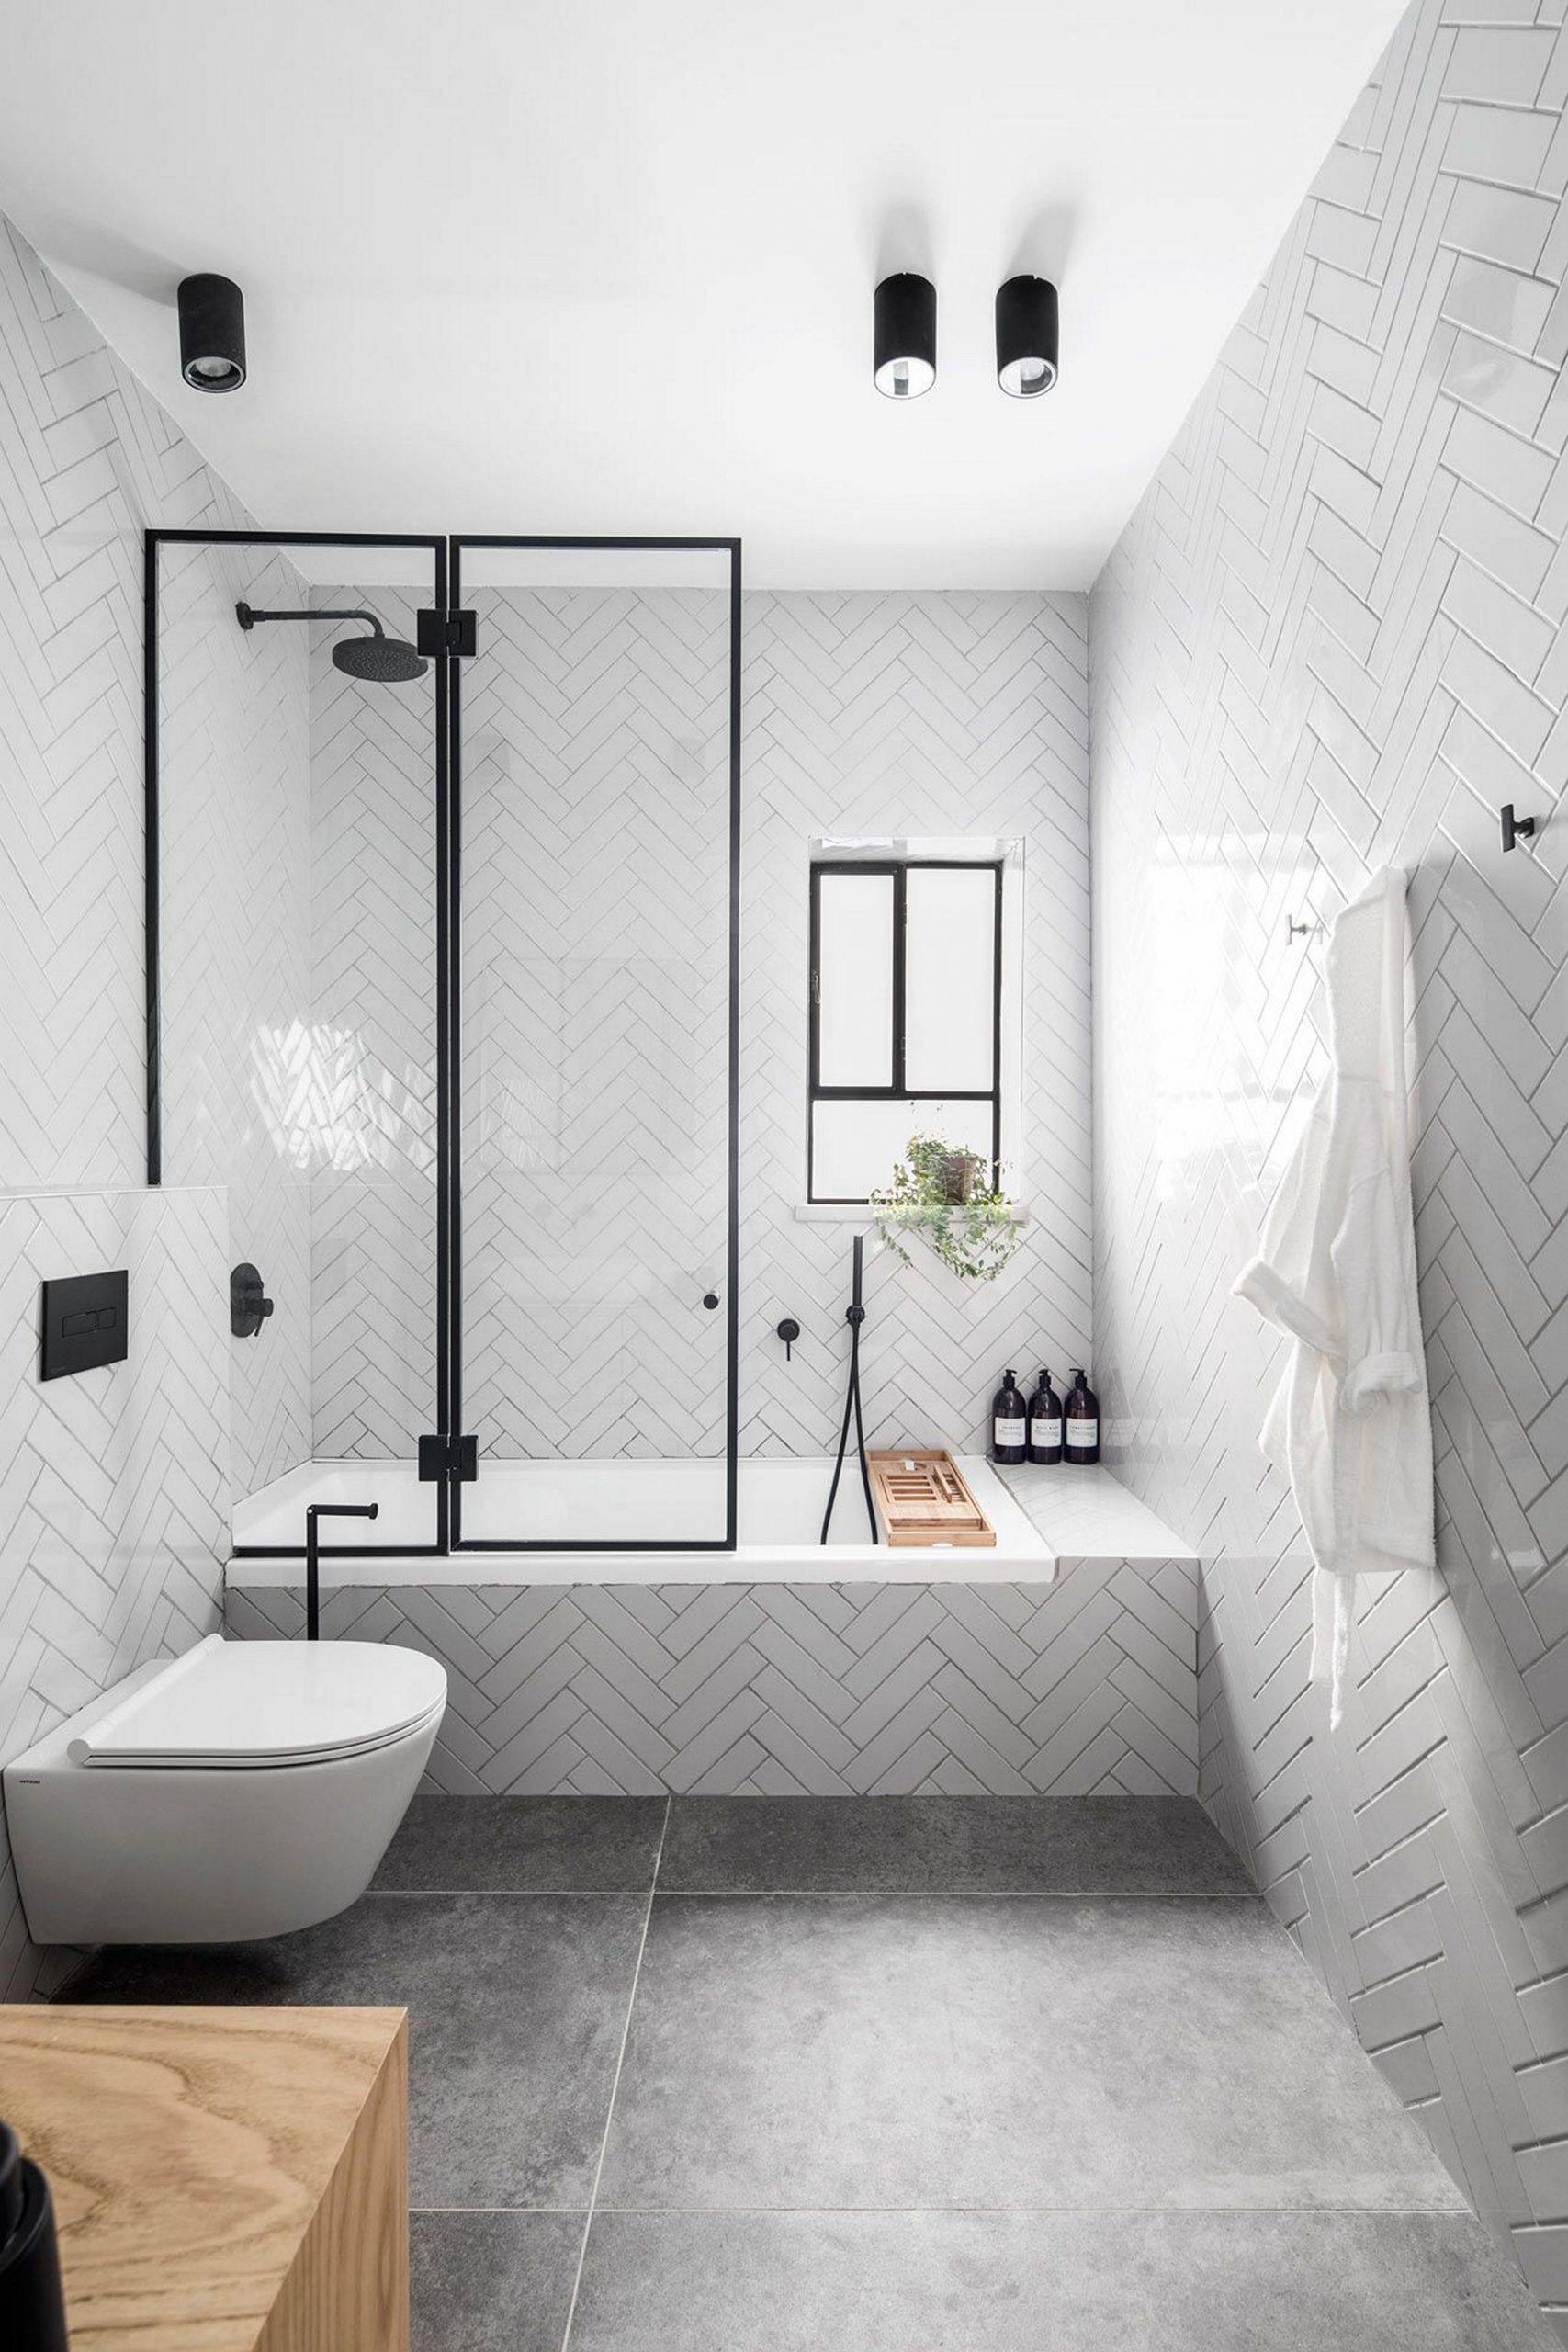 Small bathroom ideas to make it feel spacious 1